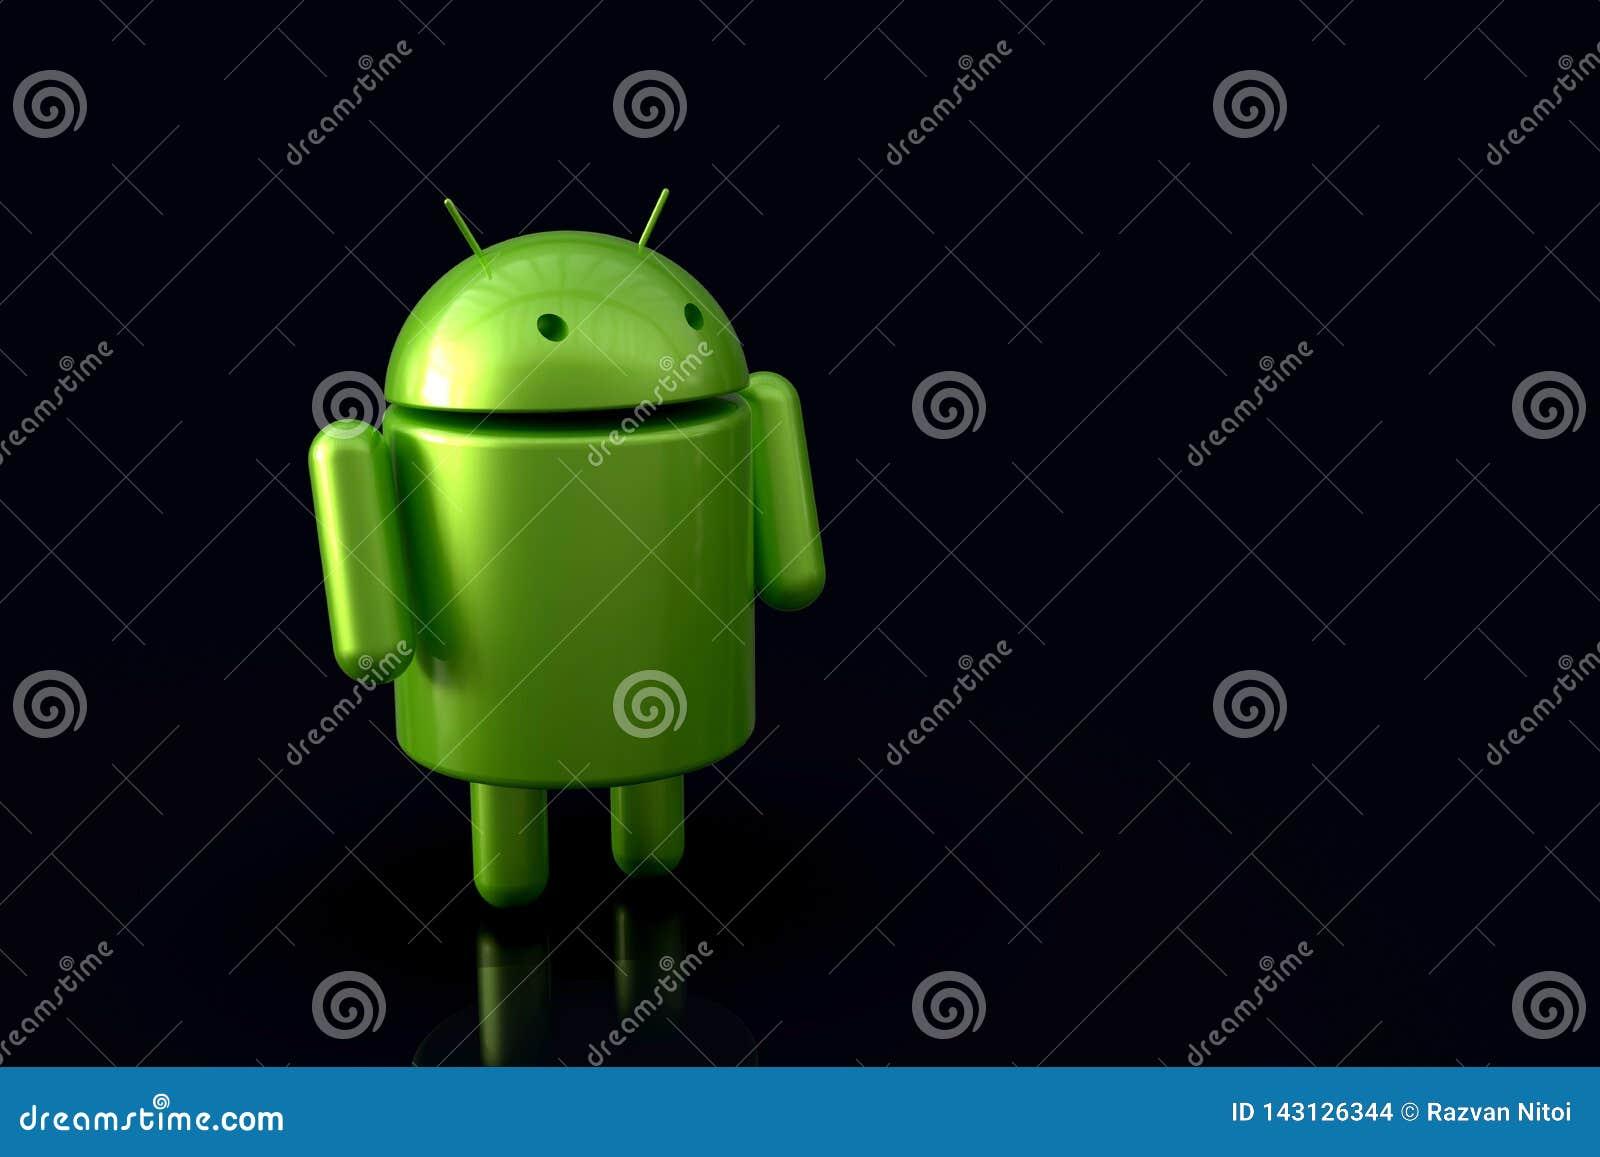 Carácter del robot del logotipo de Android, 3D en fondo oscuro